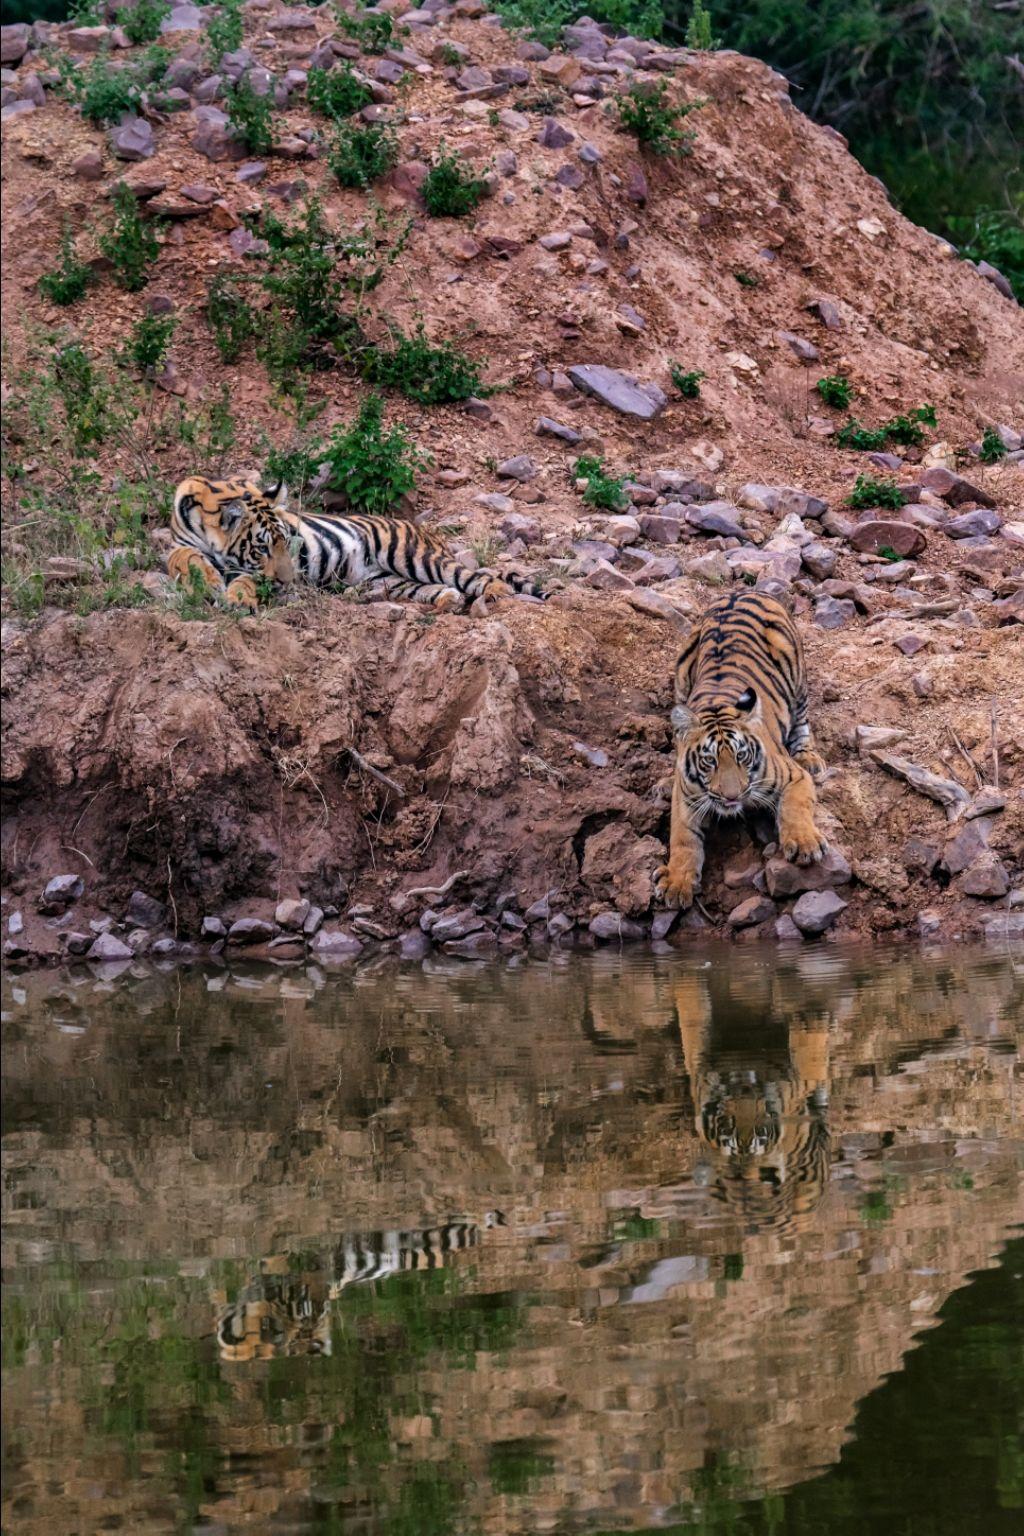 Photo of Tadoba National Park By Harsh Jain